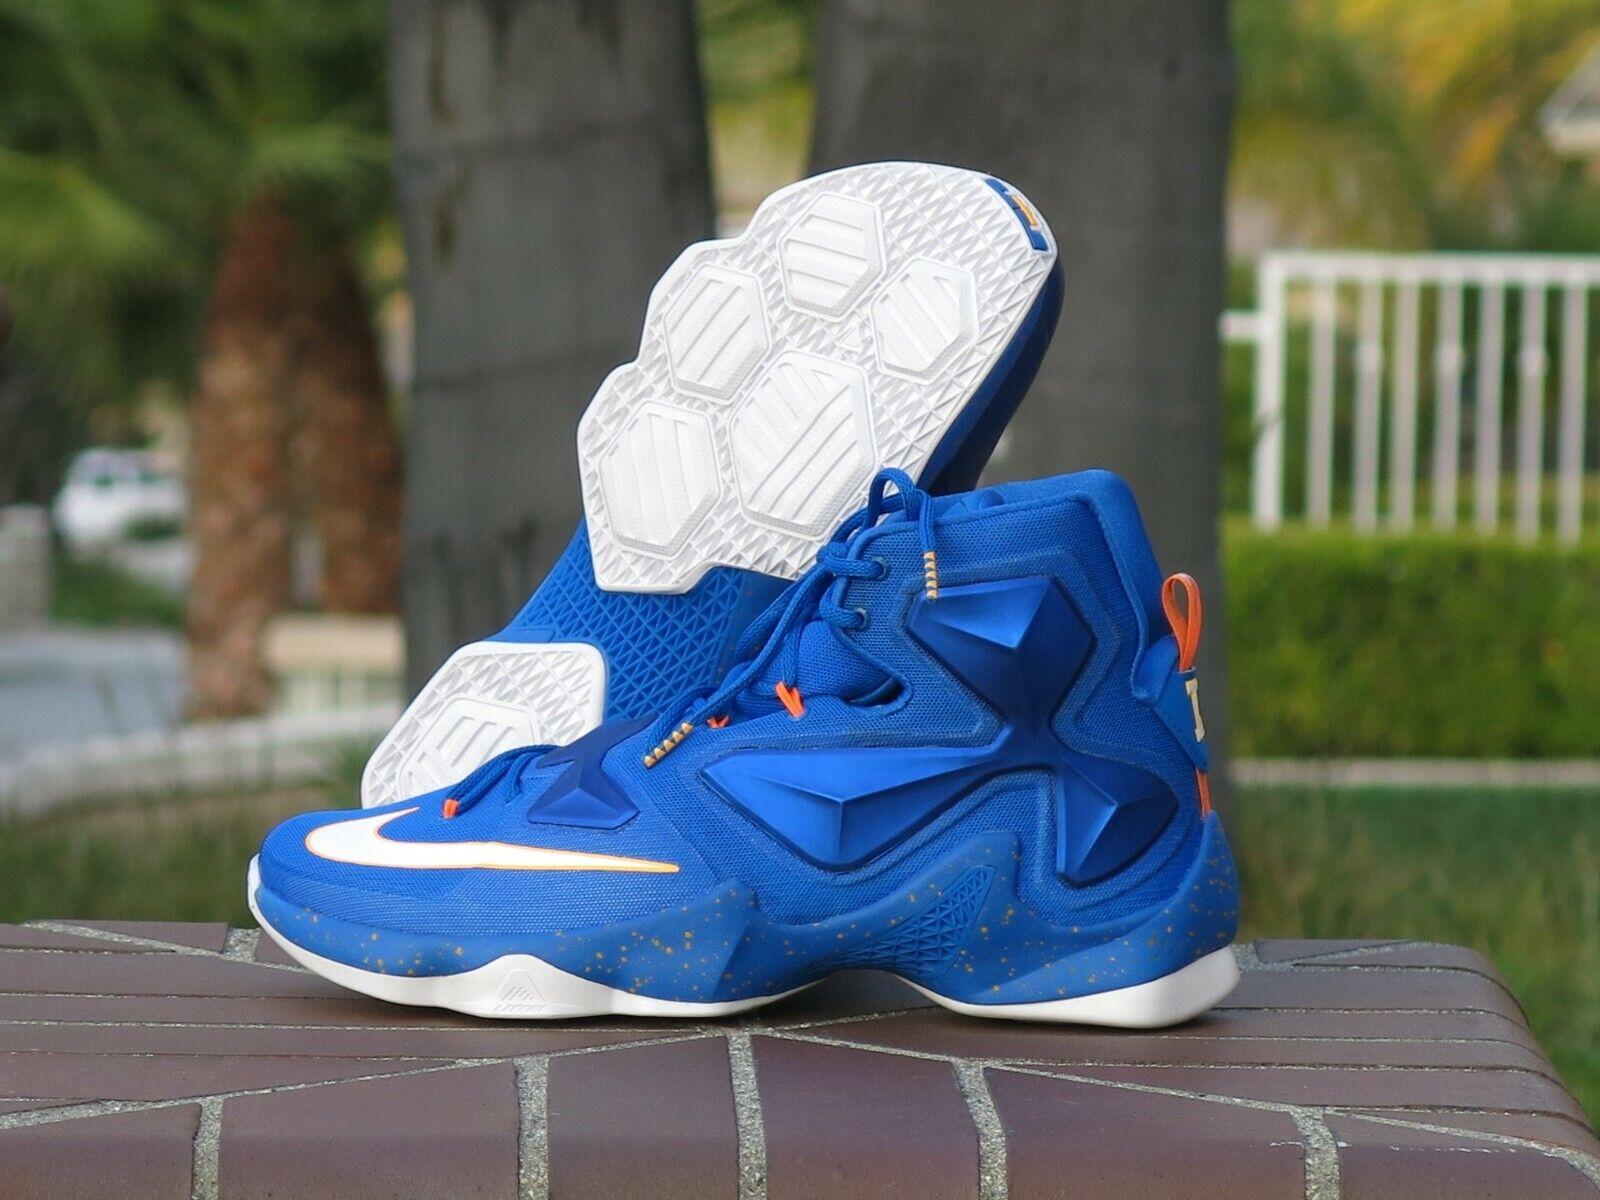 Nike Lebron James XIII Men's Basketball Sneakers 807219-418